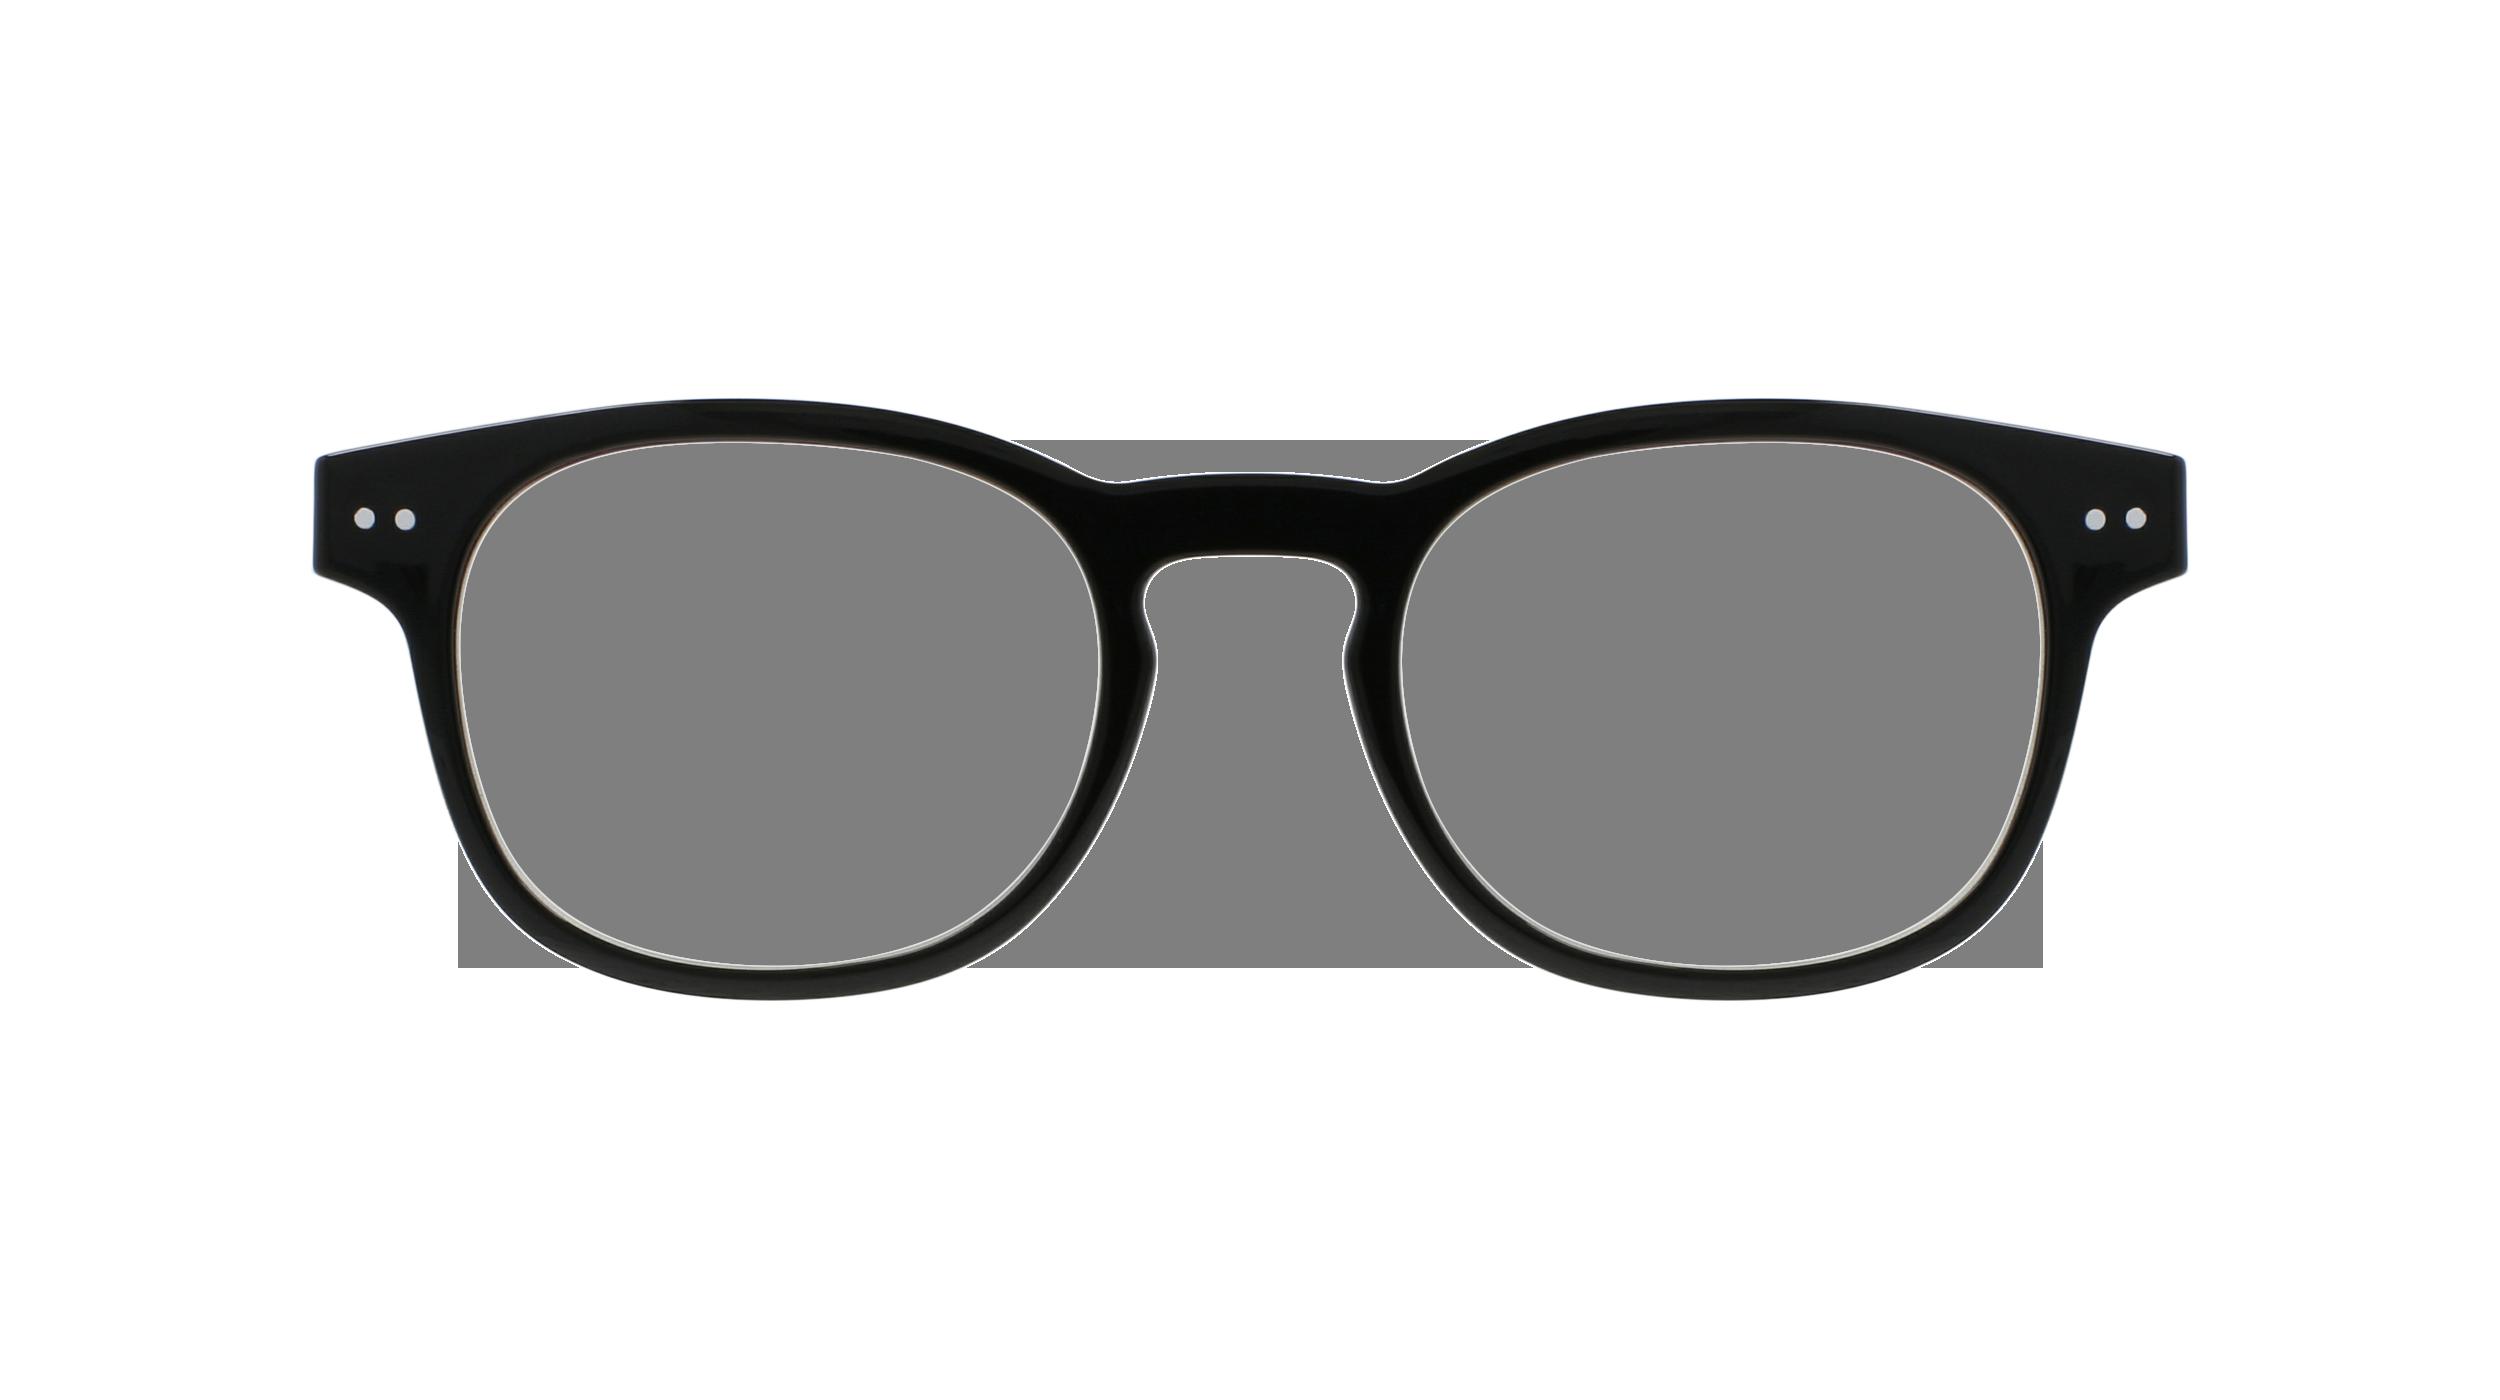 afflelou/france/products/smart_clip/clips_glasses/07630036436189.png